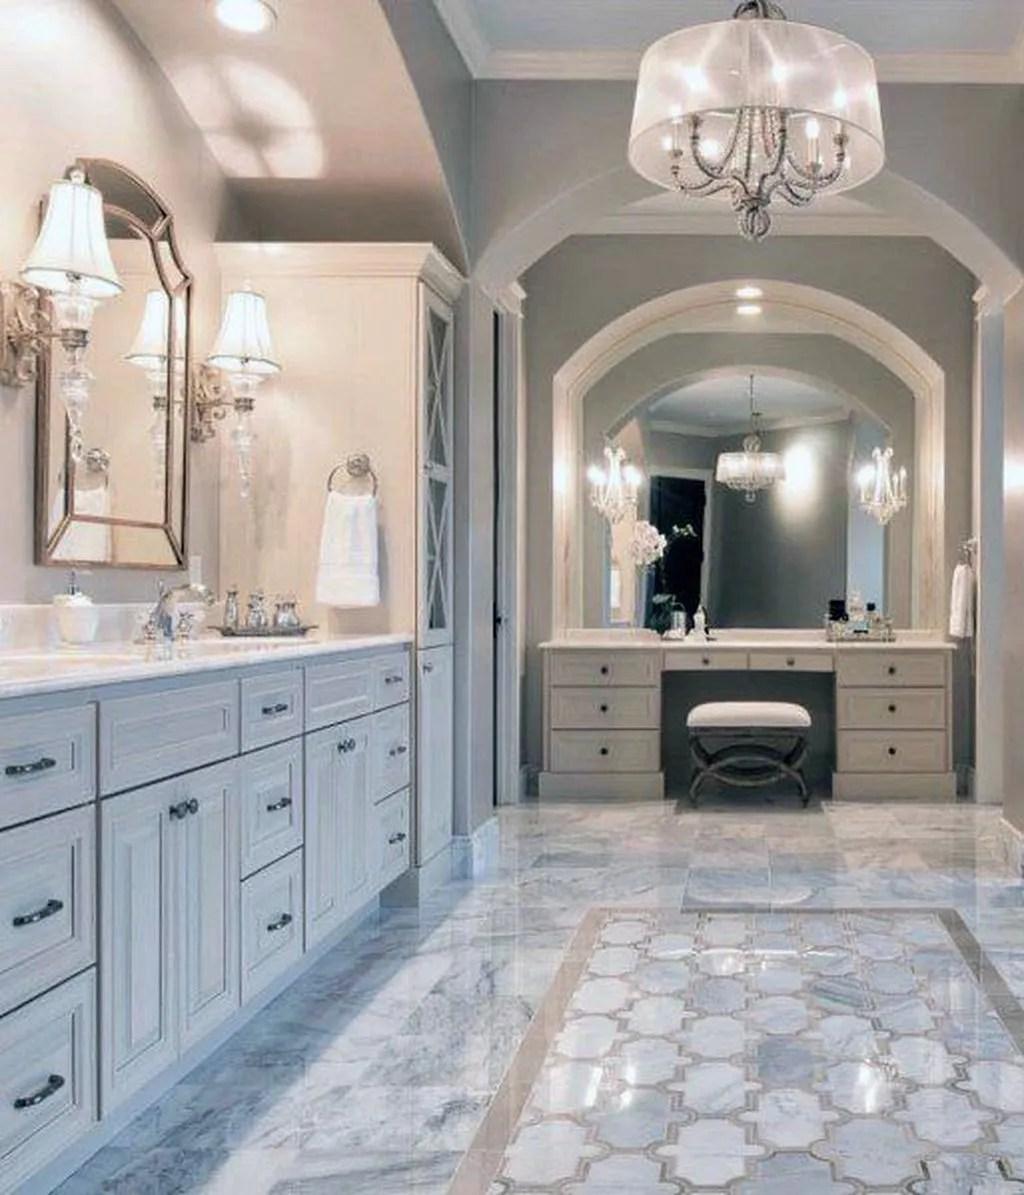 Inspiring Unique Bathroom Ideas That You Should Try 14